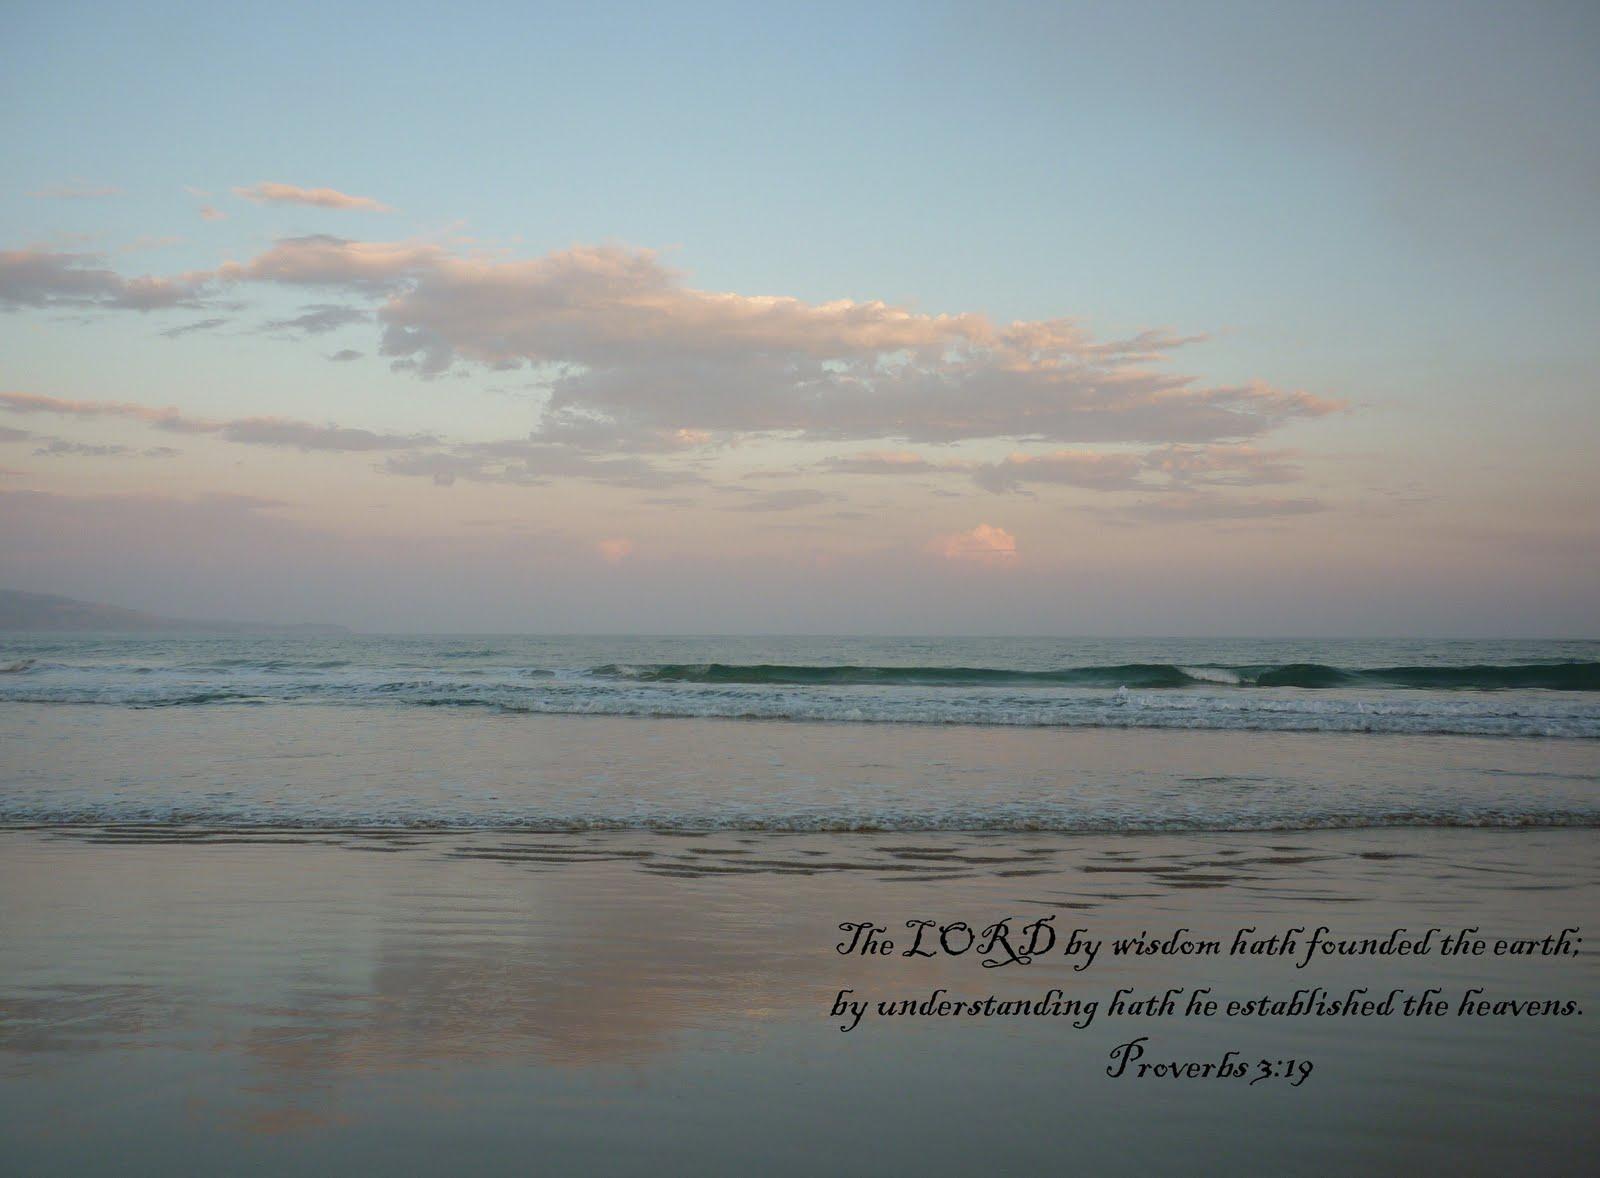 http://1.bp.blogspot.com/-MZOuEUXTH7A/Tj5qKbCcVnI/AAAAAAAAACw/ms-ZkgCpPg0/s1600/Proverbs+3_19.jpg